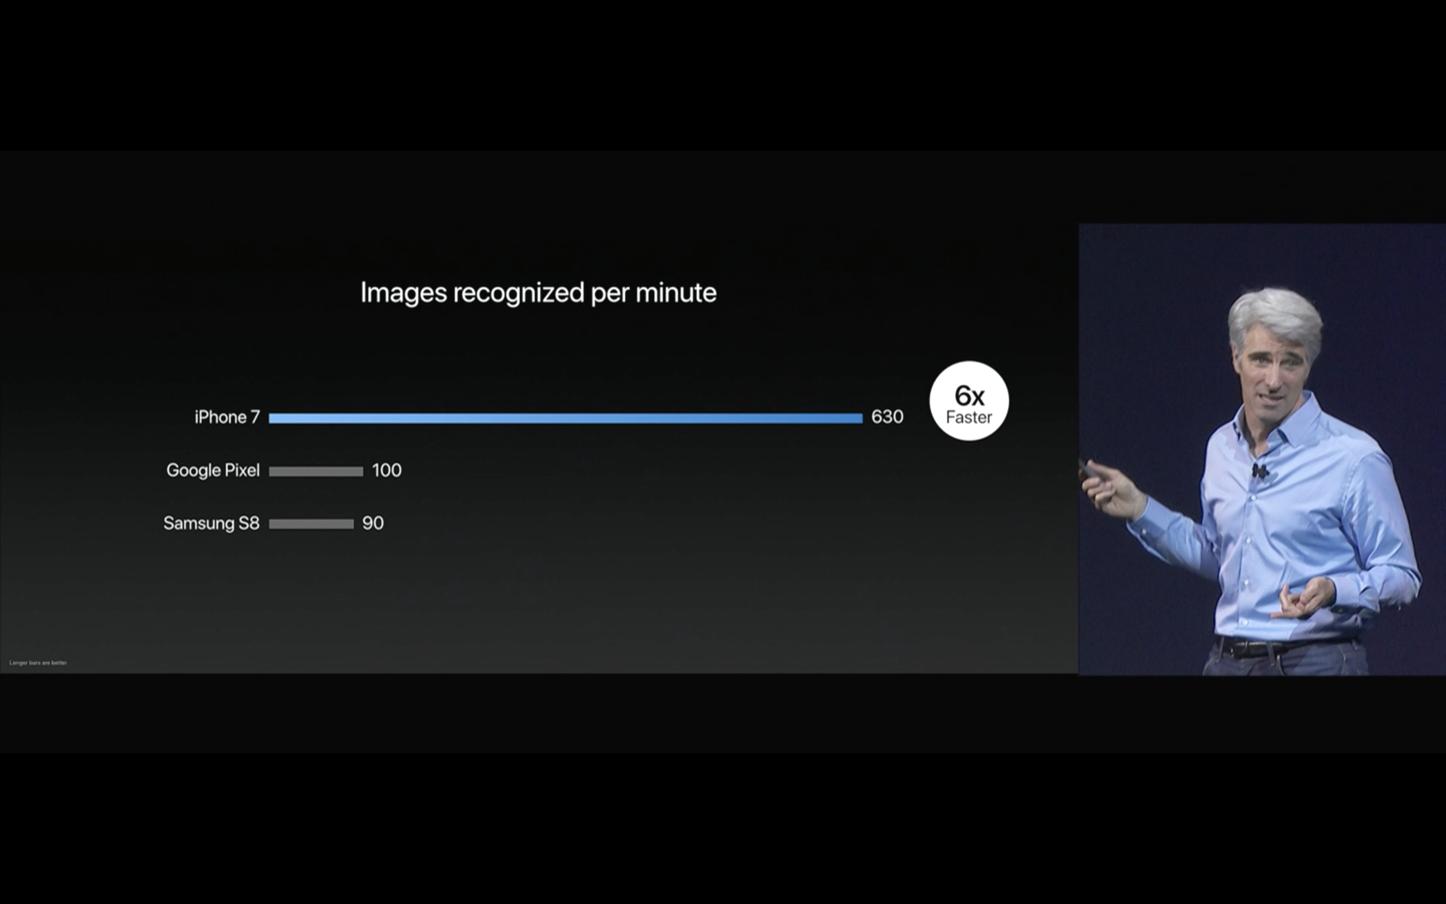 iOS11-2017-WWDC17-82.png